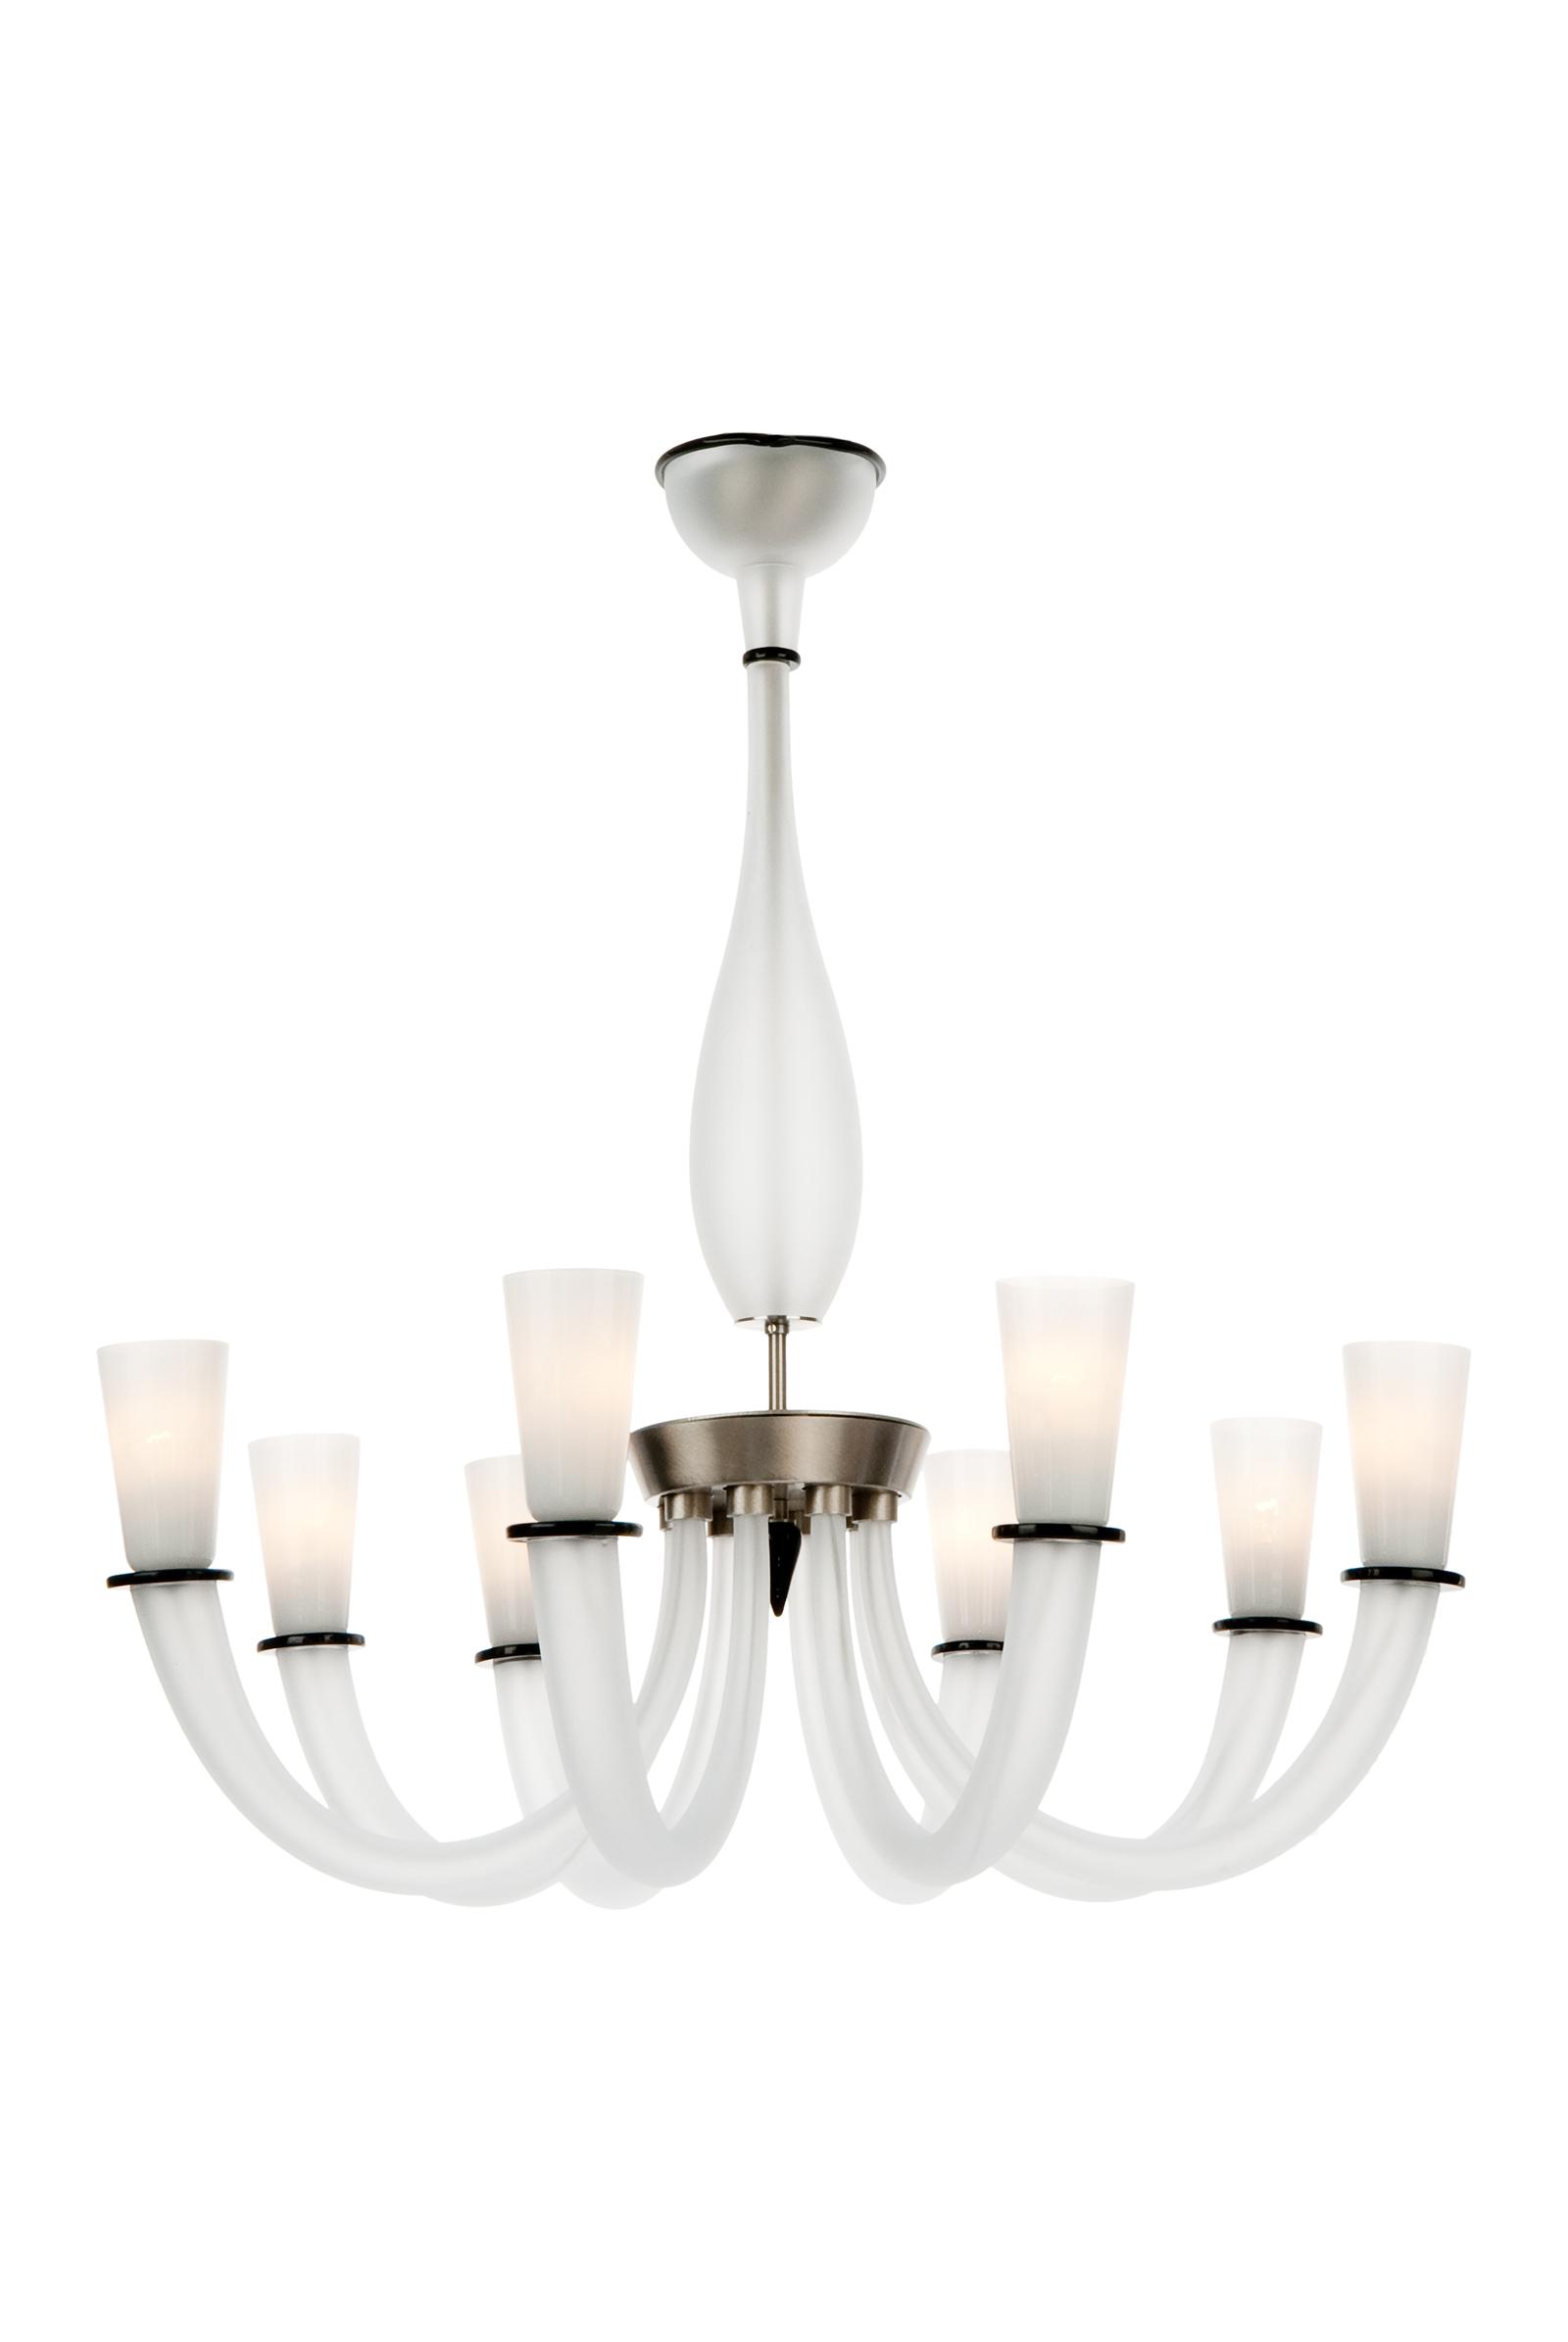 gabbiano-lustre-chandelier-veronese-1.jpg